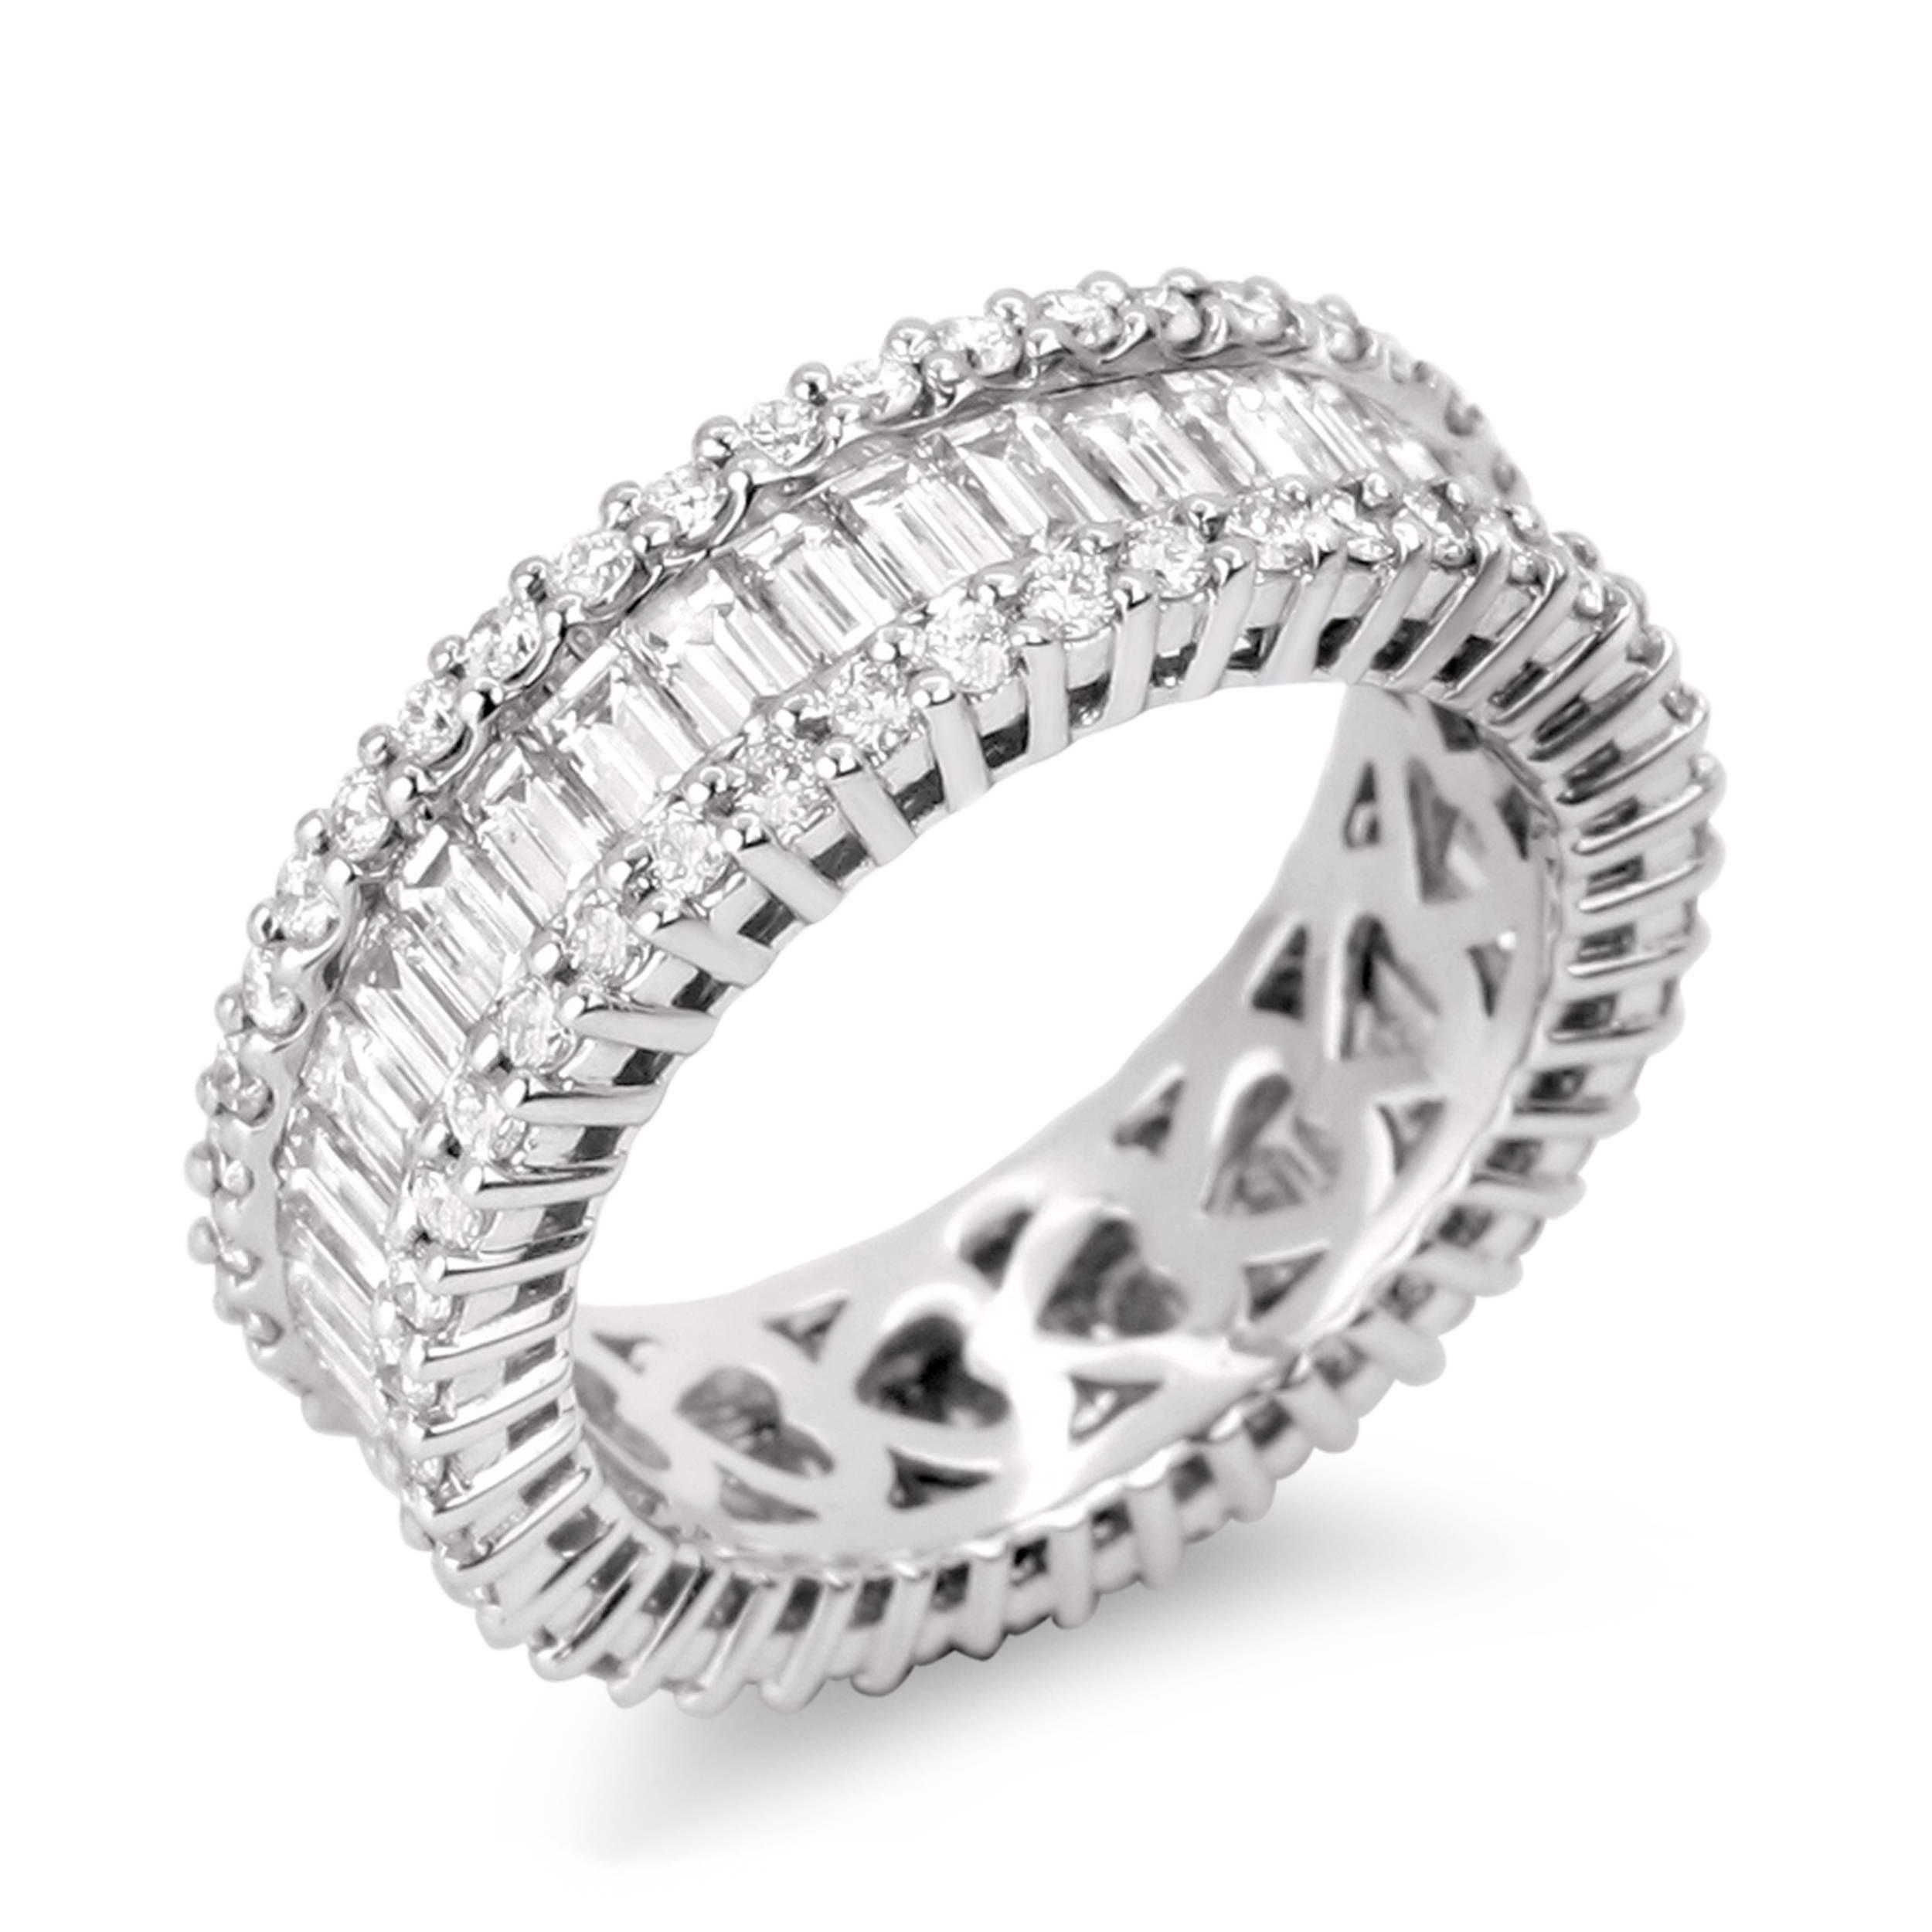 Wedding Anniversary Rings Diamonds | Wedding Ideas Pertaining To Recent 3 Diamond Anniversary Rings (View 22 of 25)